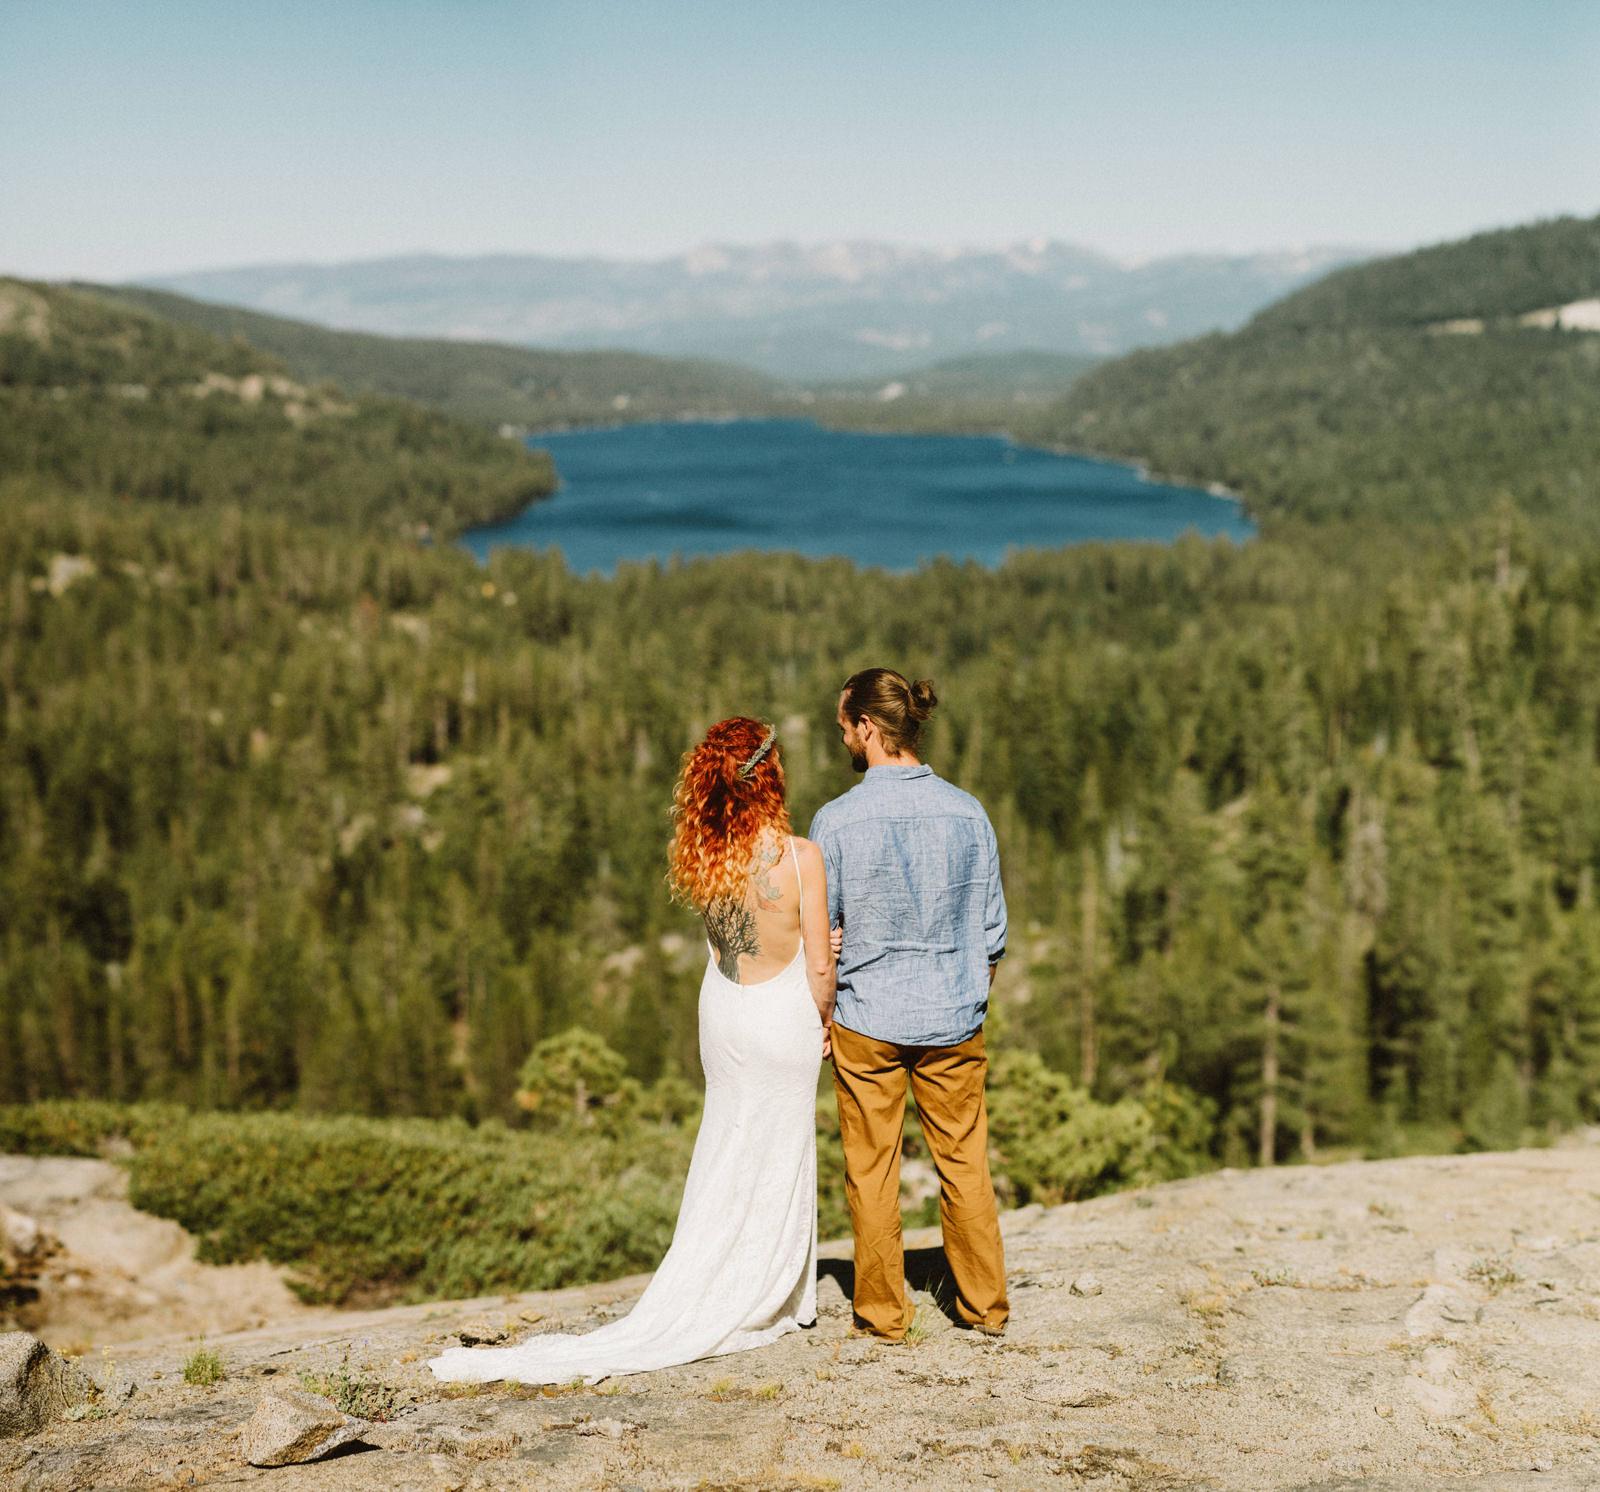 lake-tahoe-elopement-035 LAKE TAHOE ELOPEMENT